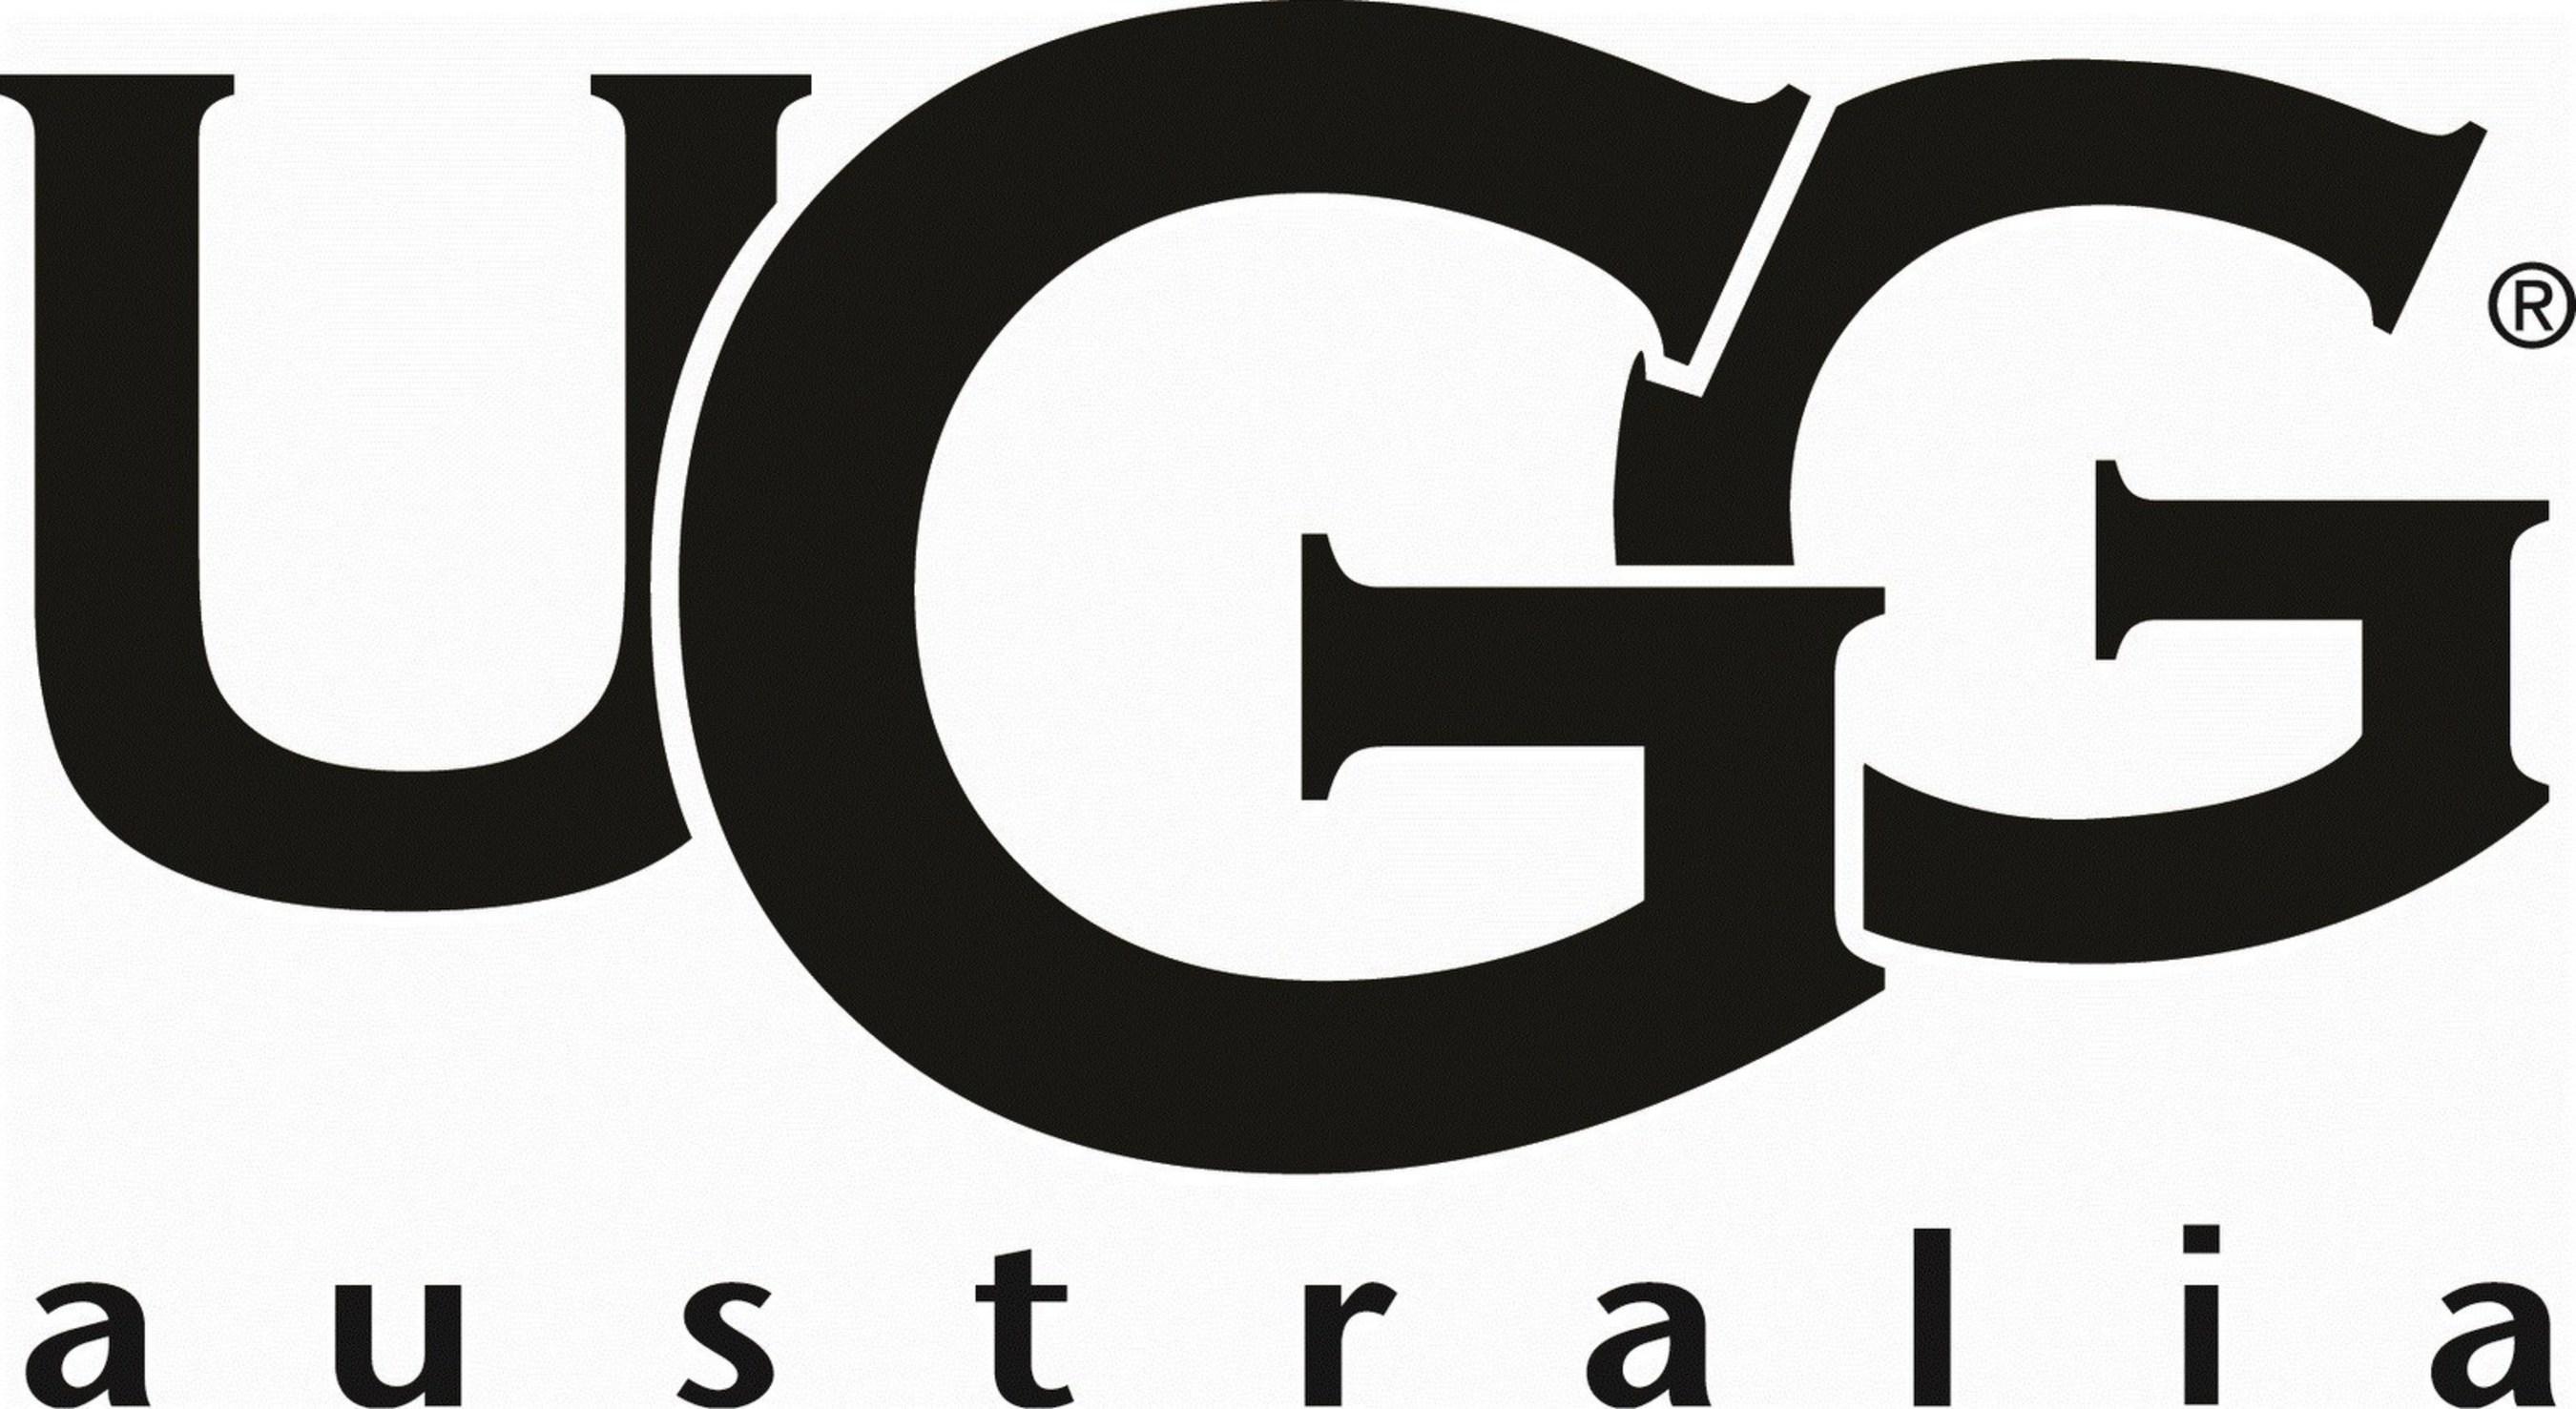 ugg authorized retailers canada